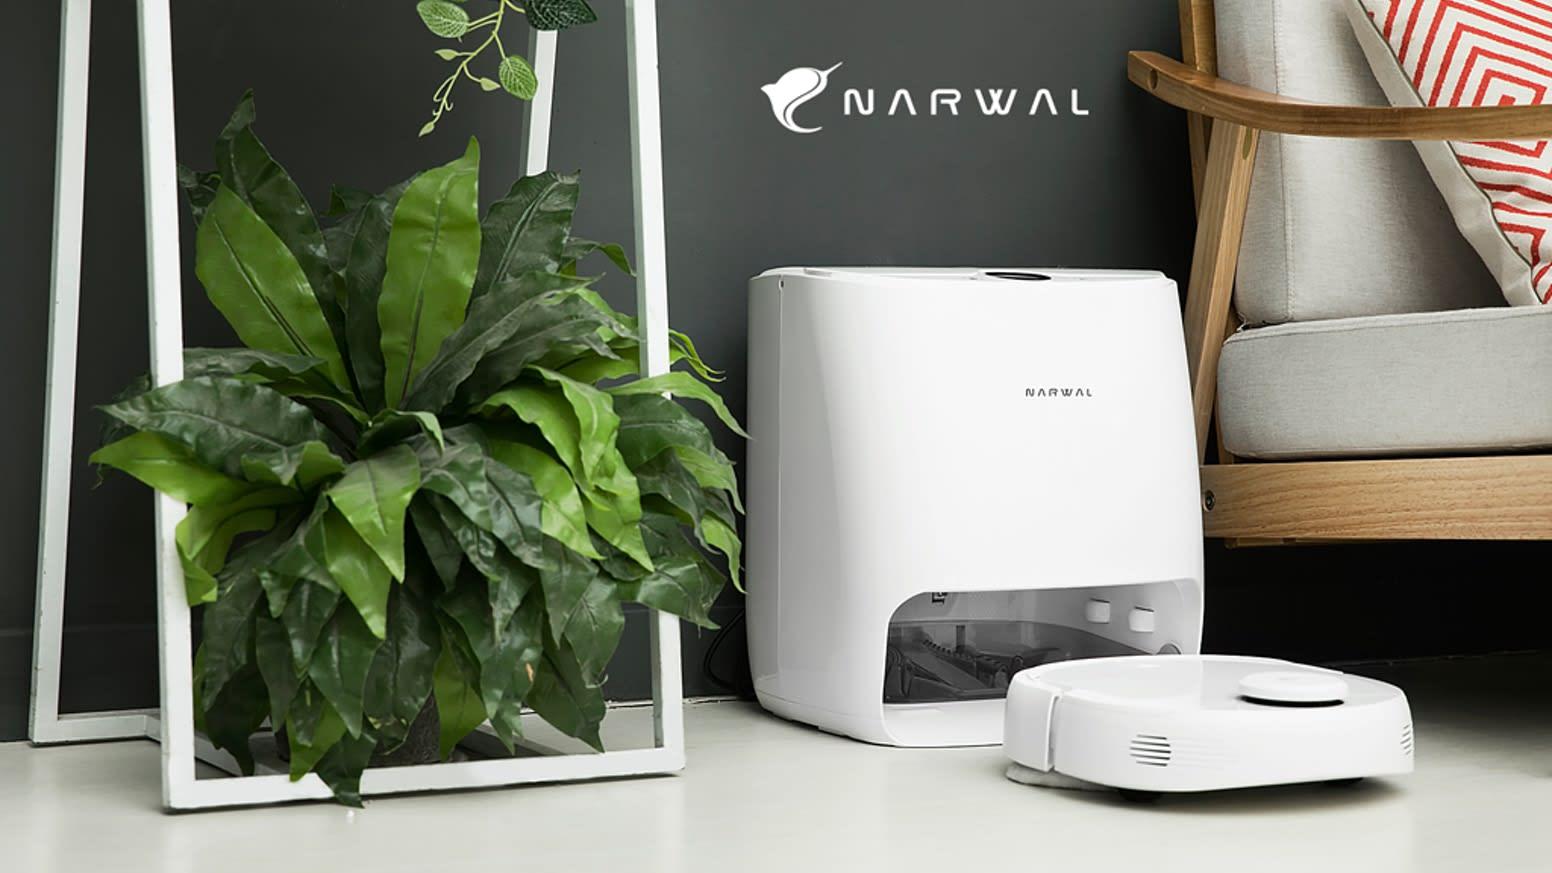 Narwal Mop & Vacuum Robot